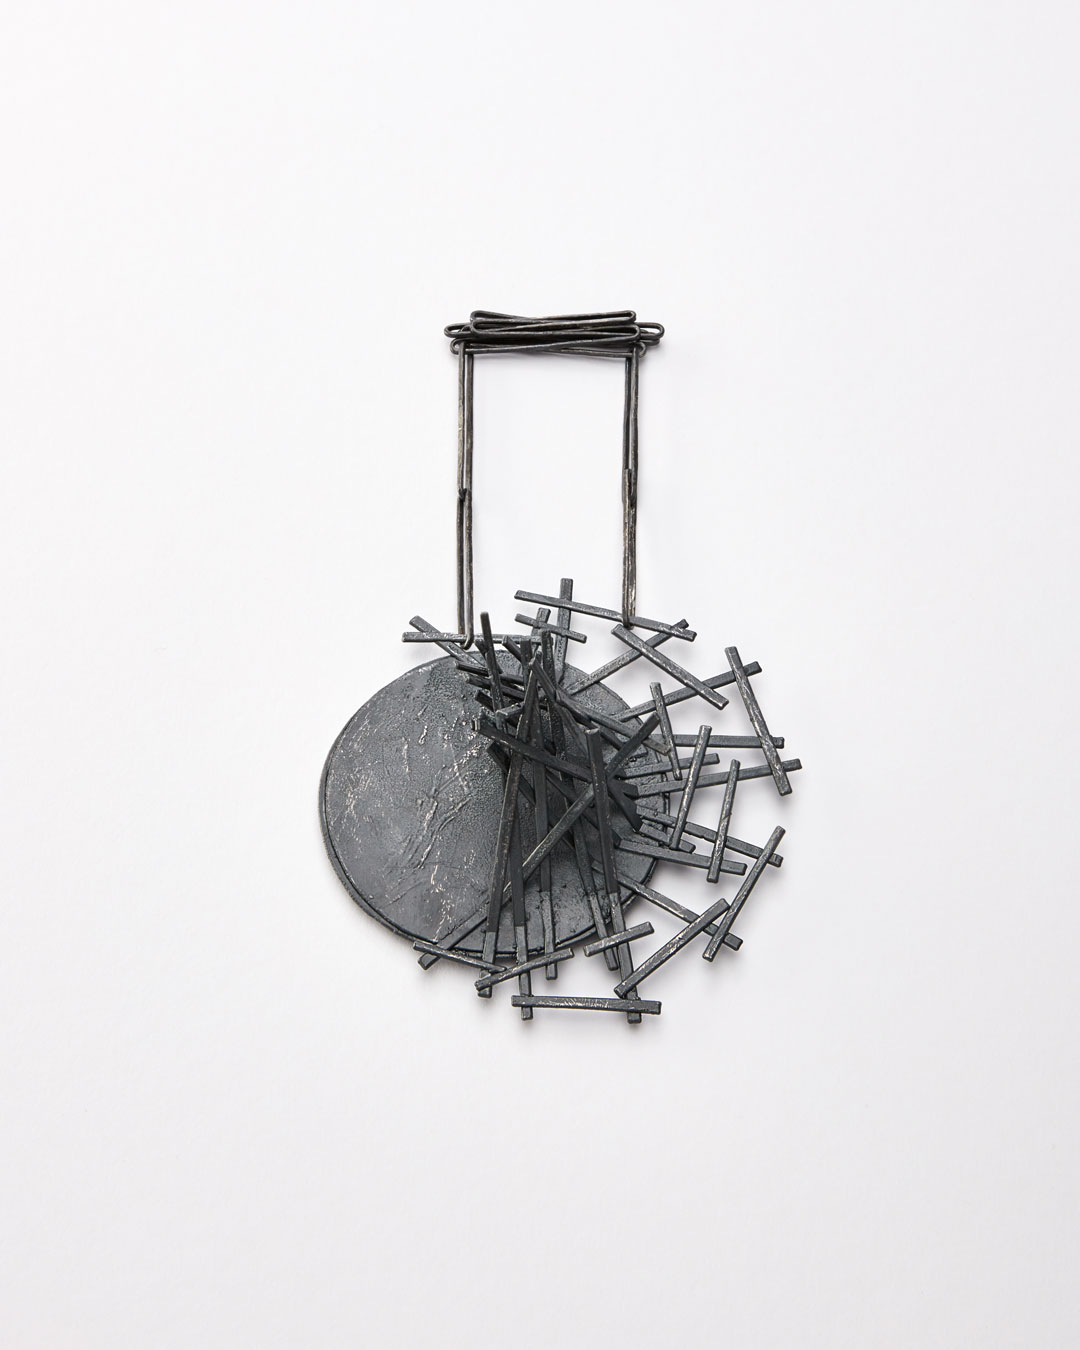 Iris Bodemer, Gegenüberstellung 5 (Juxtaposition 5), 2019, pendant; silver, thermoplastic, 115 x 110 x 45 mm, €3500